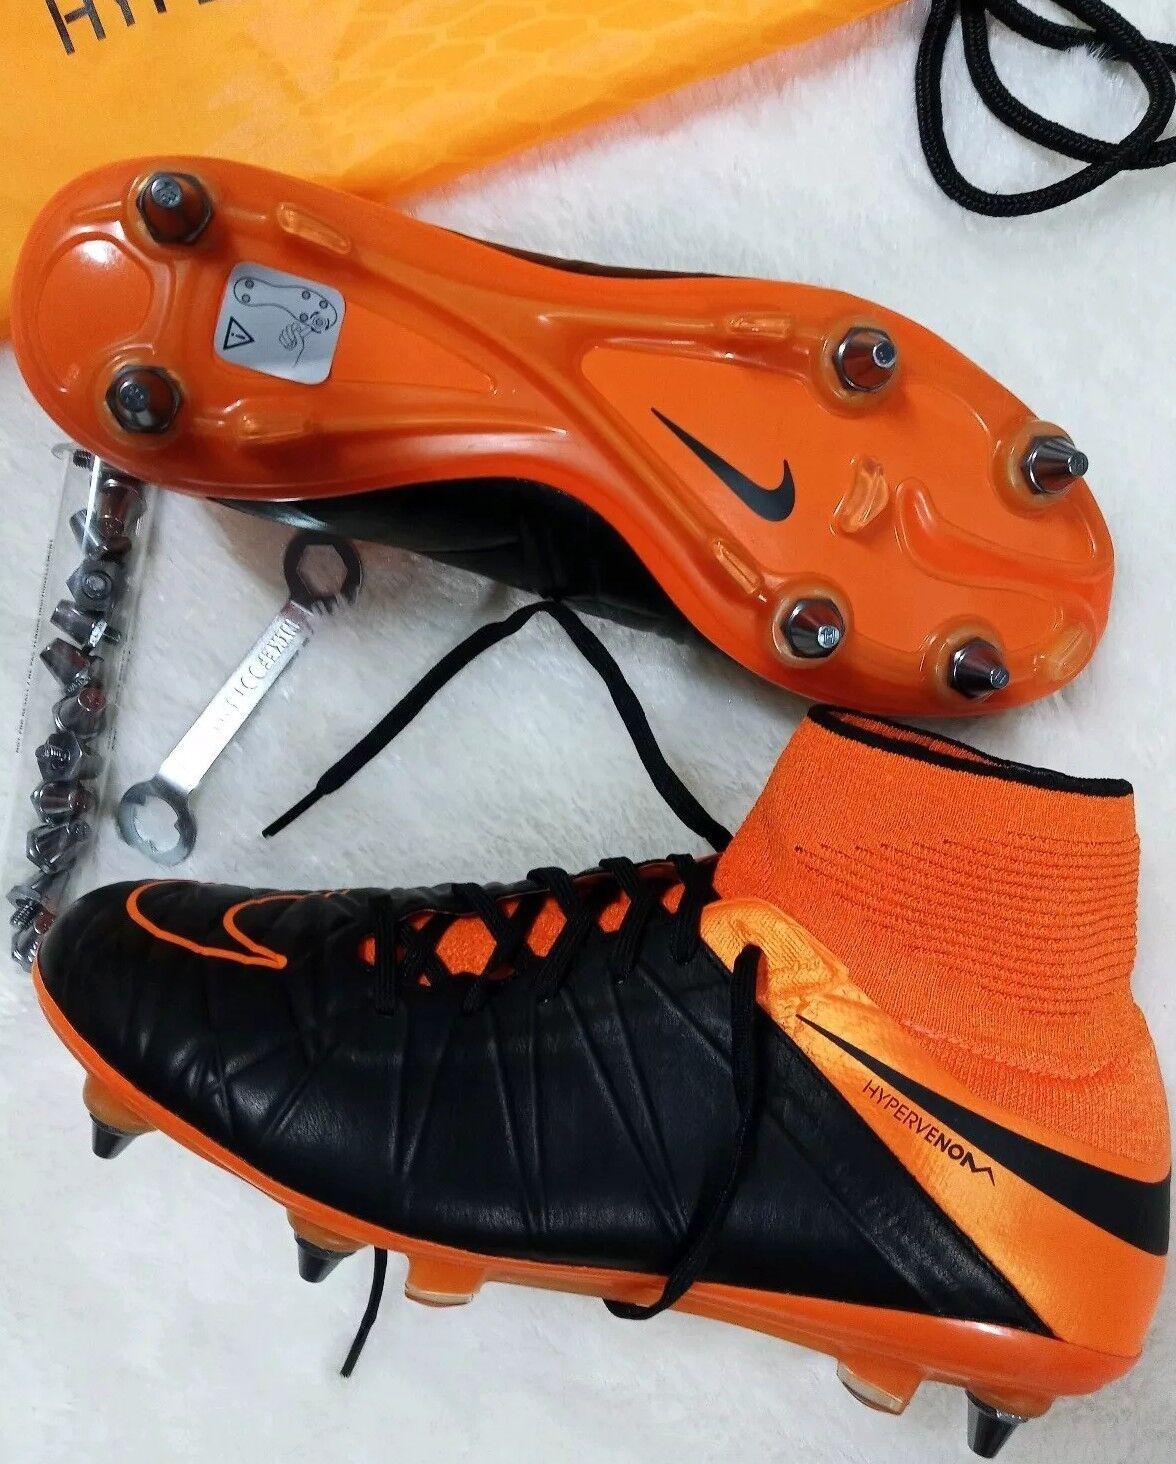 8 para Hombre Nike Hypervenom Fantasma 2 Cuero SG Pro 747500 008 Negro Naranja Fútbol